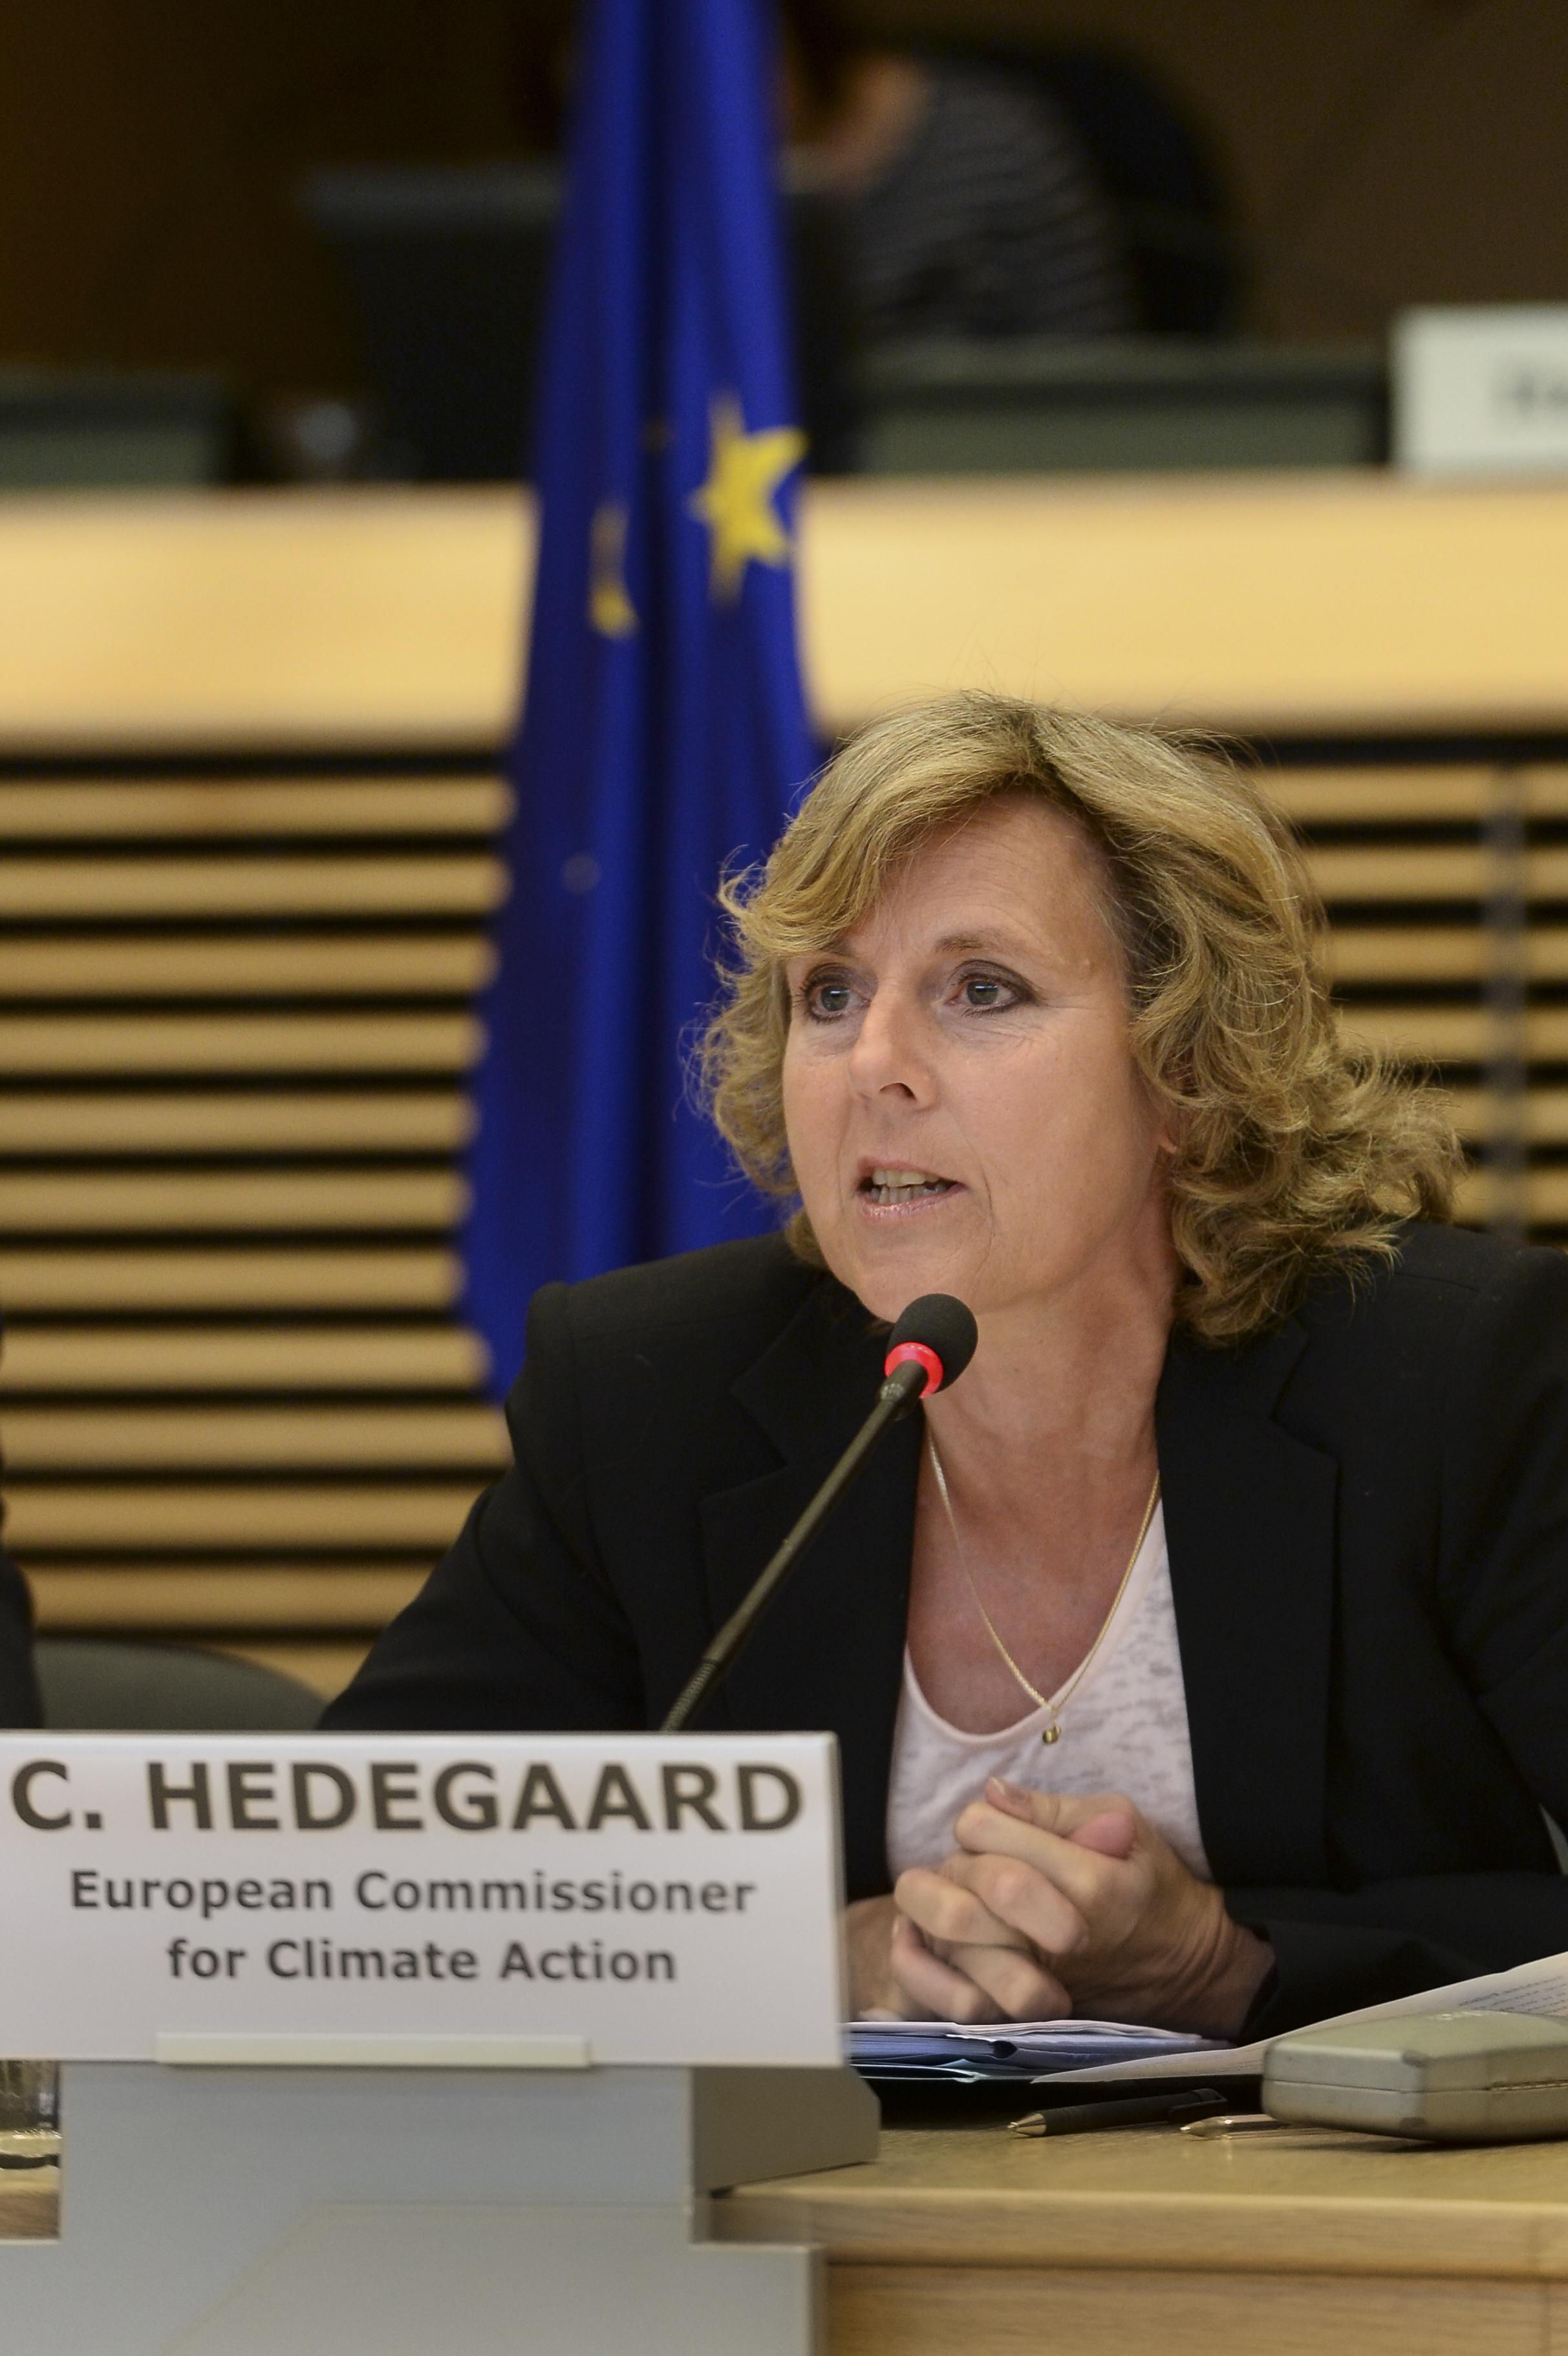 Connie_Hedegaard,_Danmarks_miljominister_och_nordisk_samarbetsminister.jpg